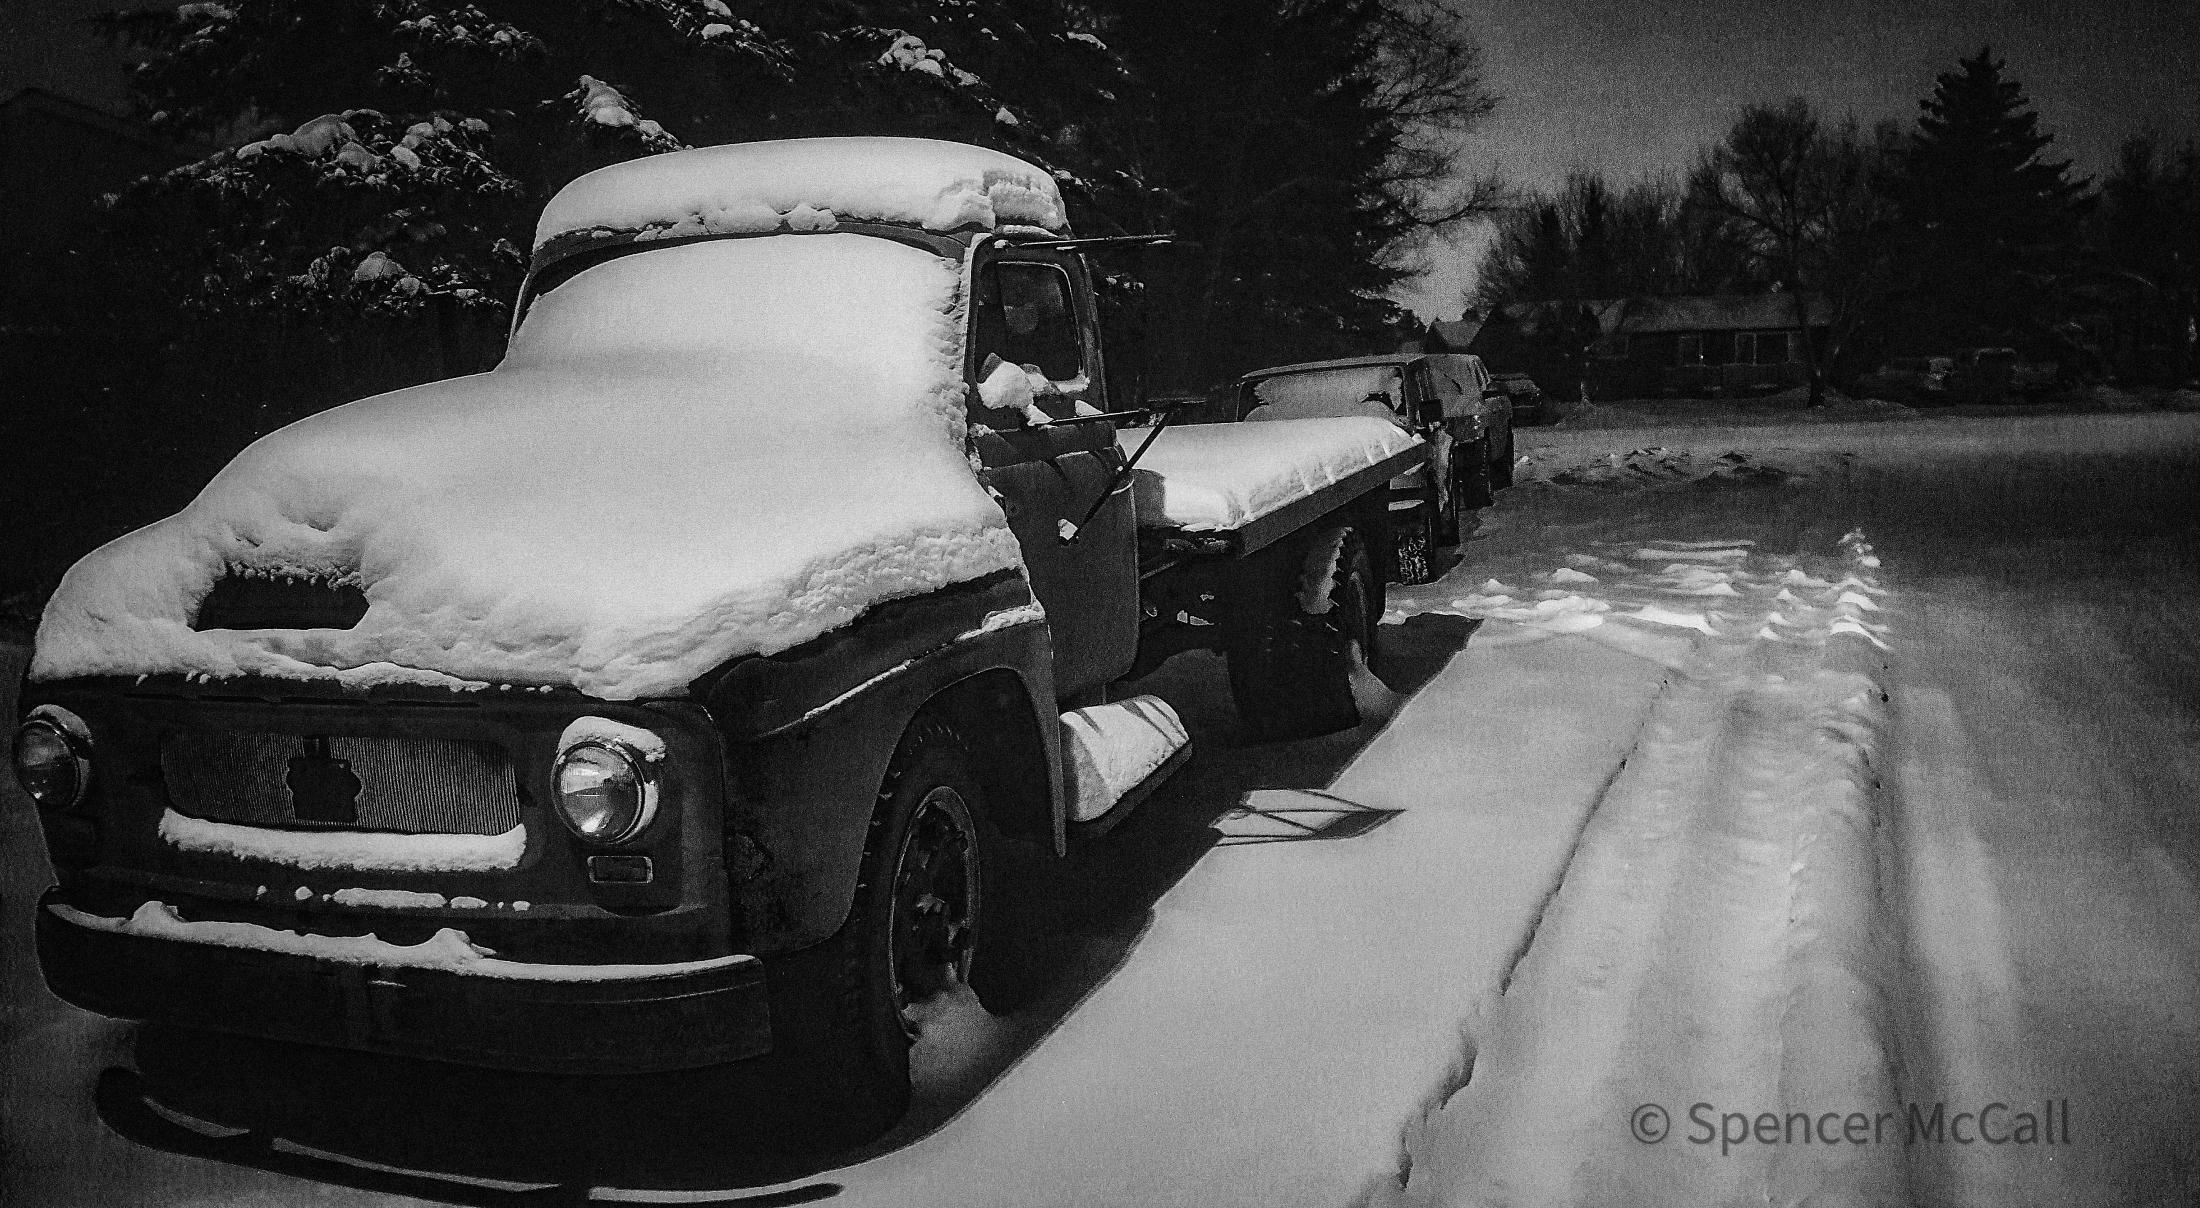 Art and Documentary Photography - Loading _____2021_Spencer_McCall__Parked__Erindale_Neighborhood__Saskatoon__.jpg